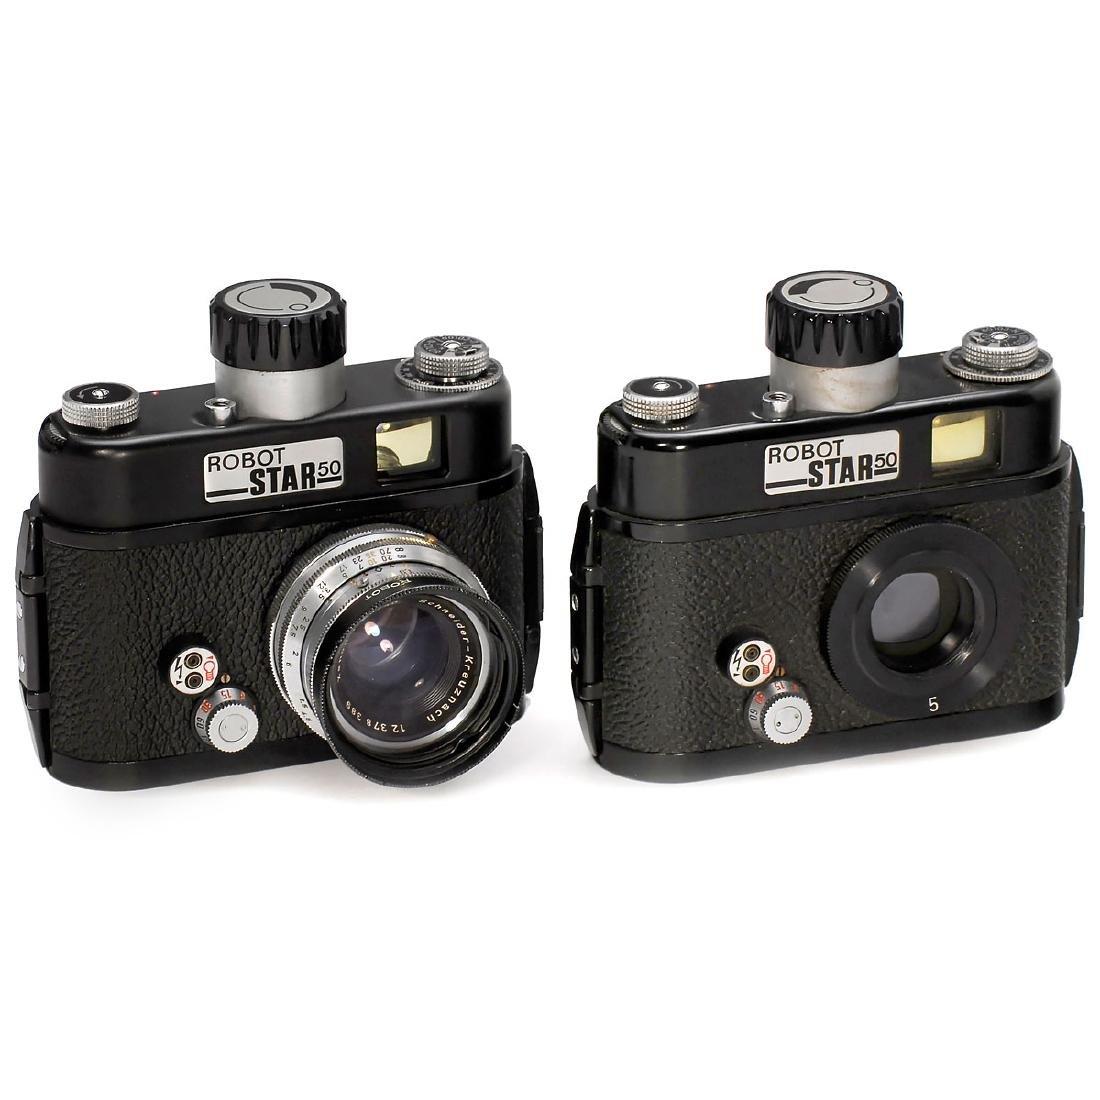 2 Robot Star 50 Cameras, 1969